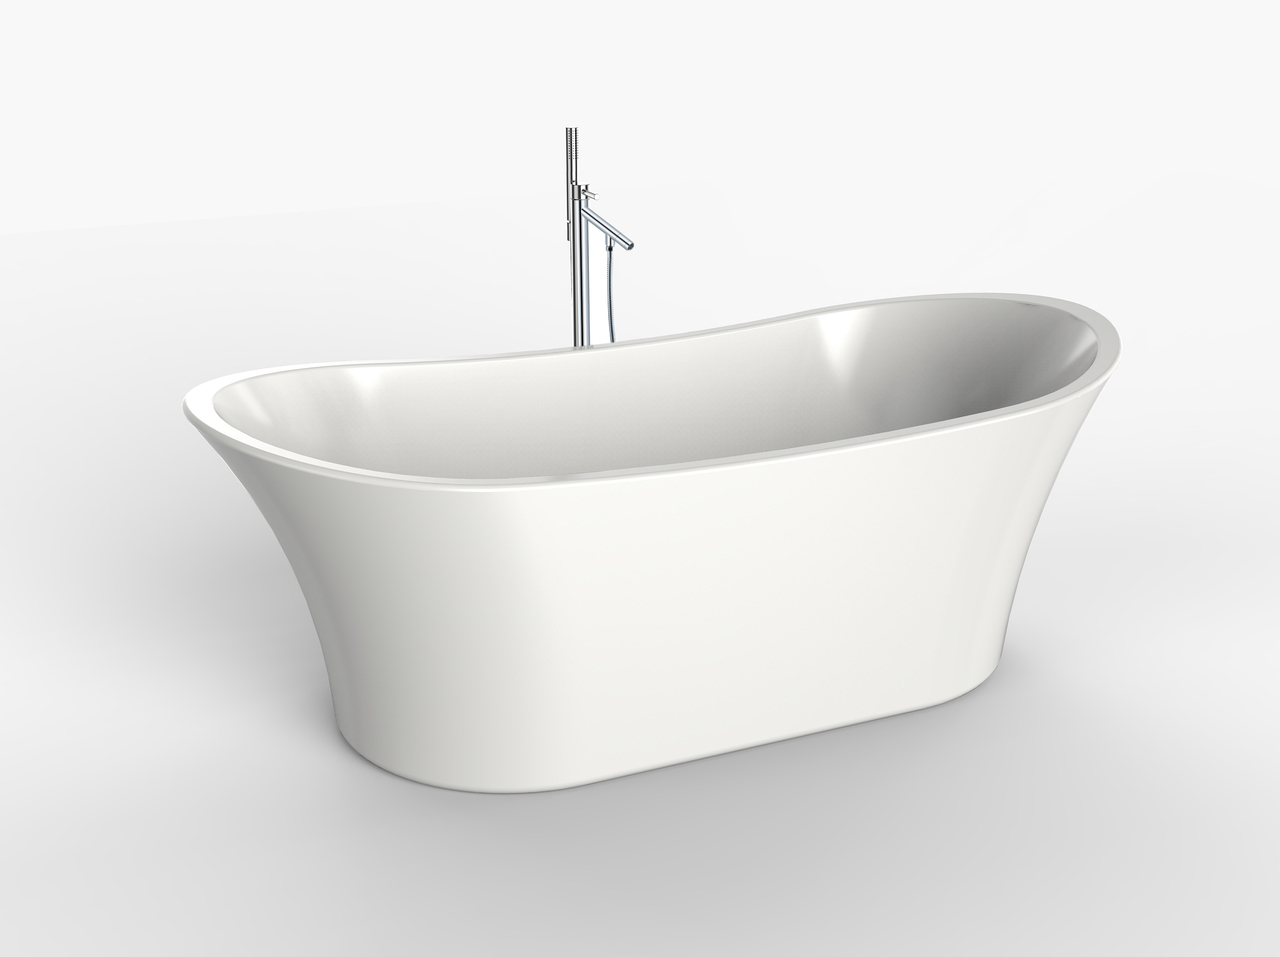 71″ Creswell Scooped Oval Freestanding Tub & Primrose Floor-Mounted ...